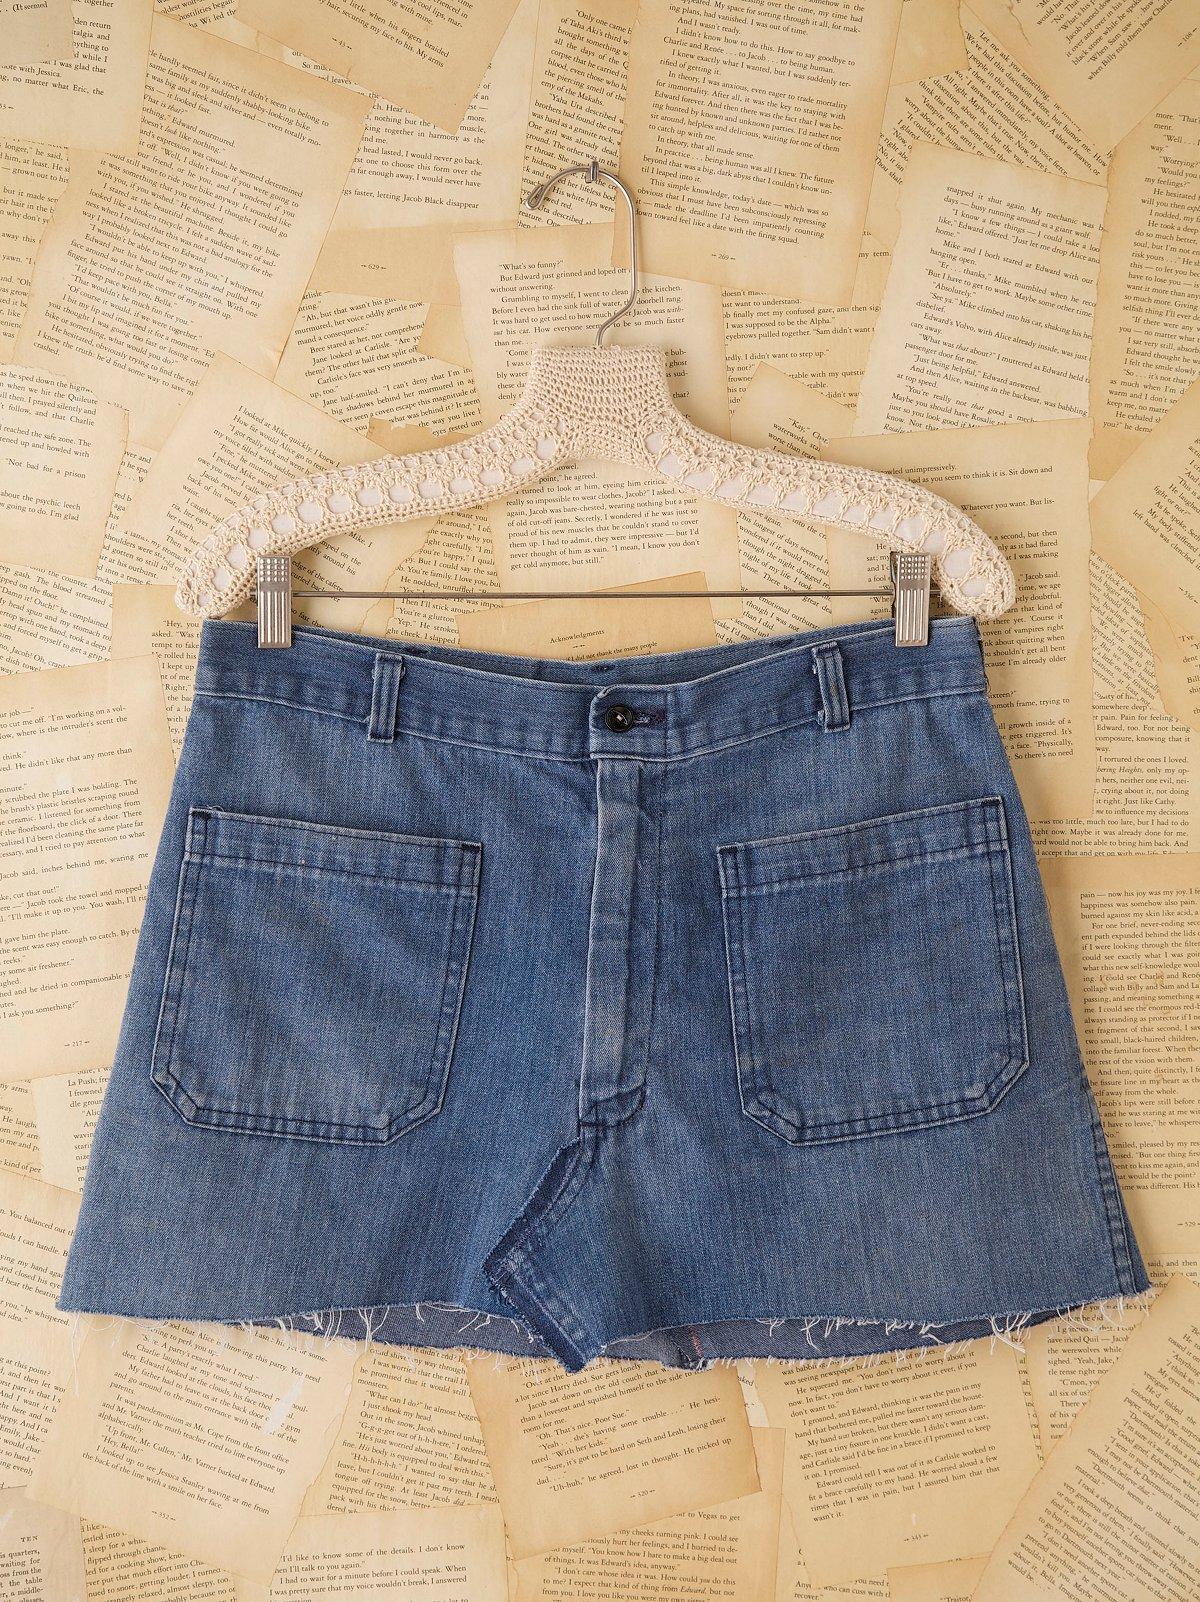 Vintage Reinforcement Skirt